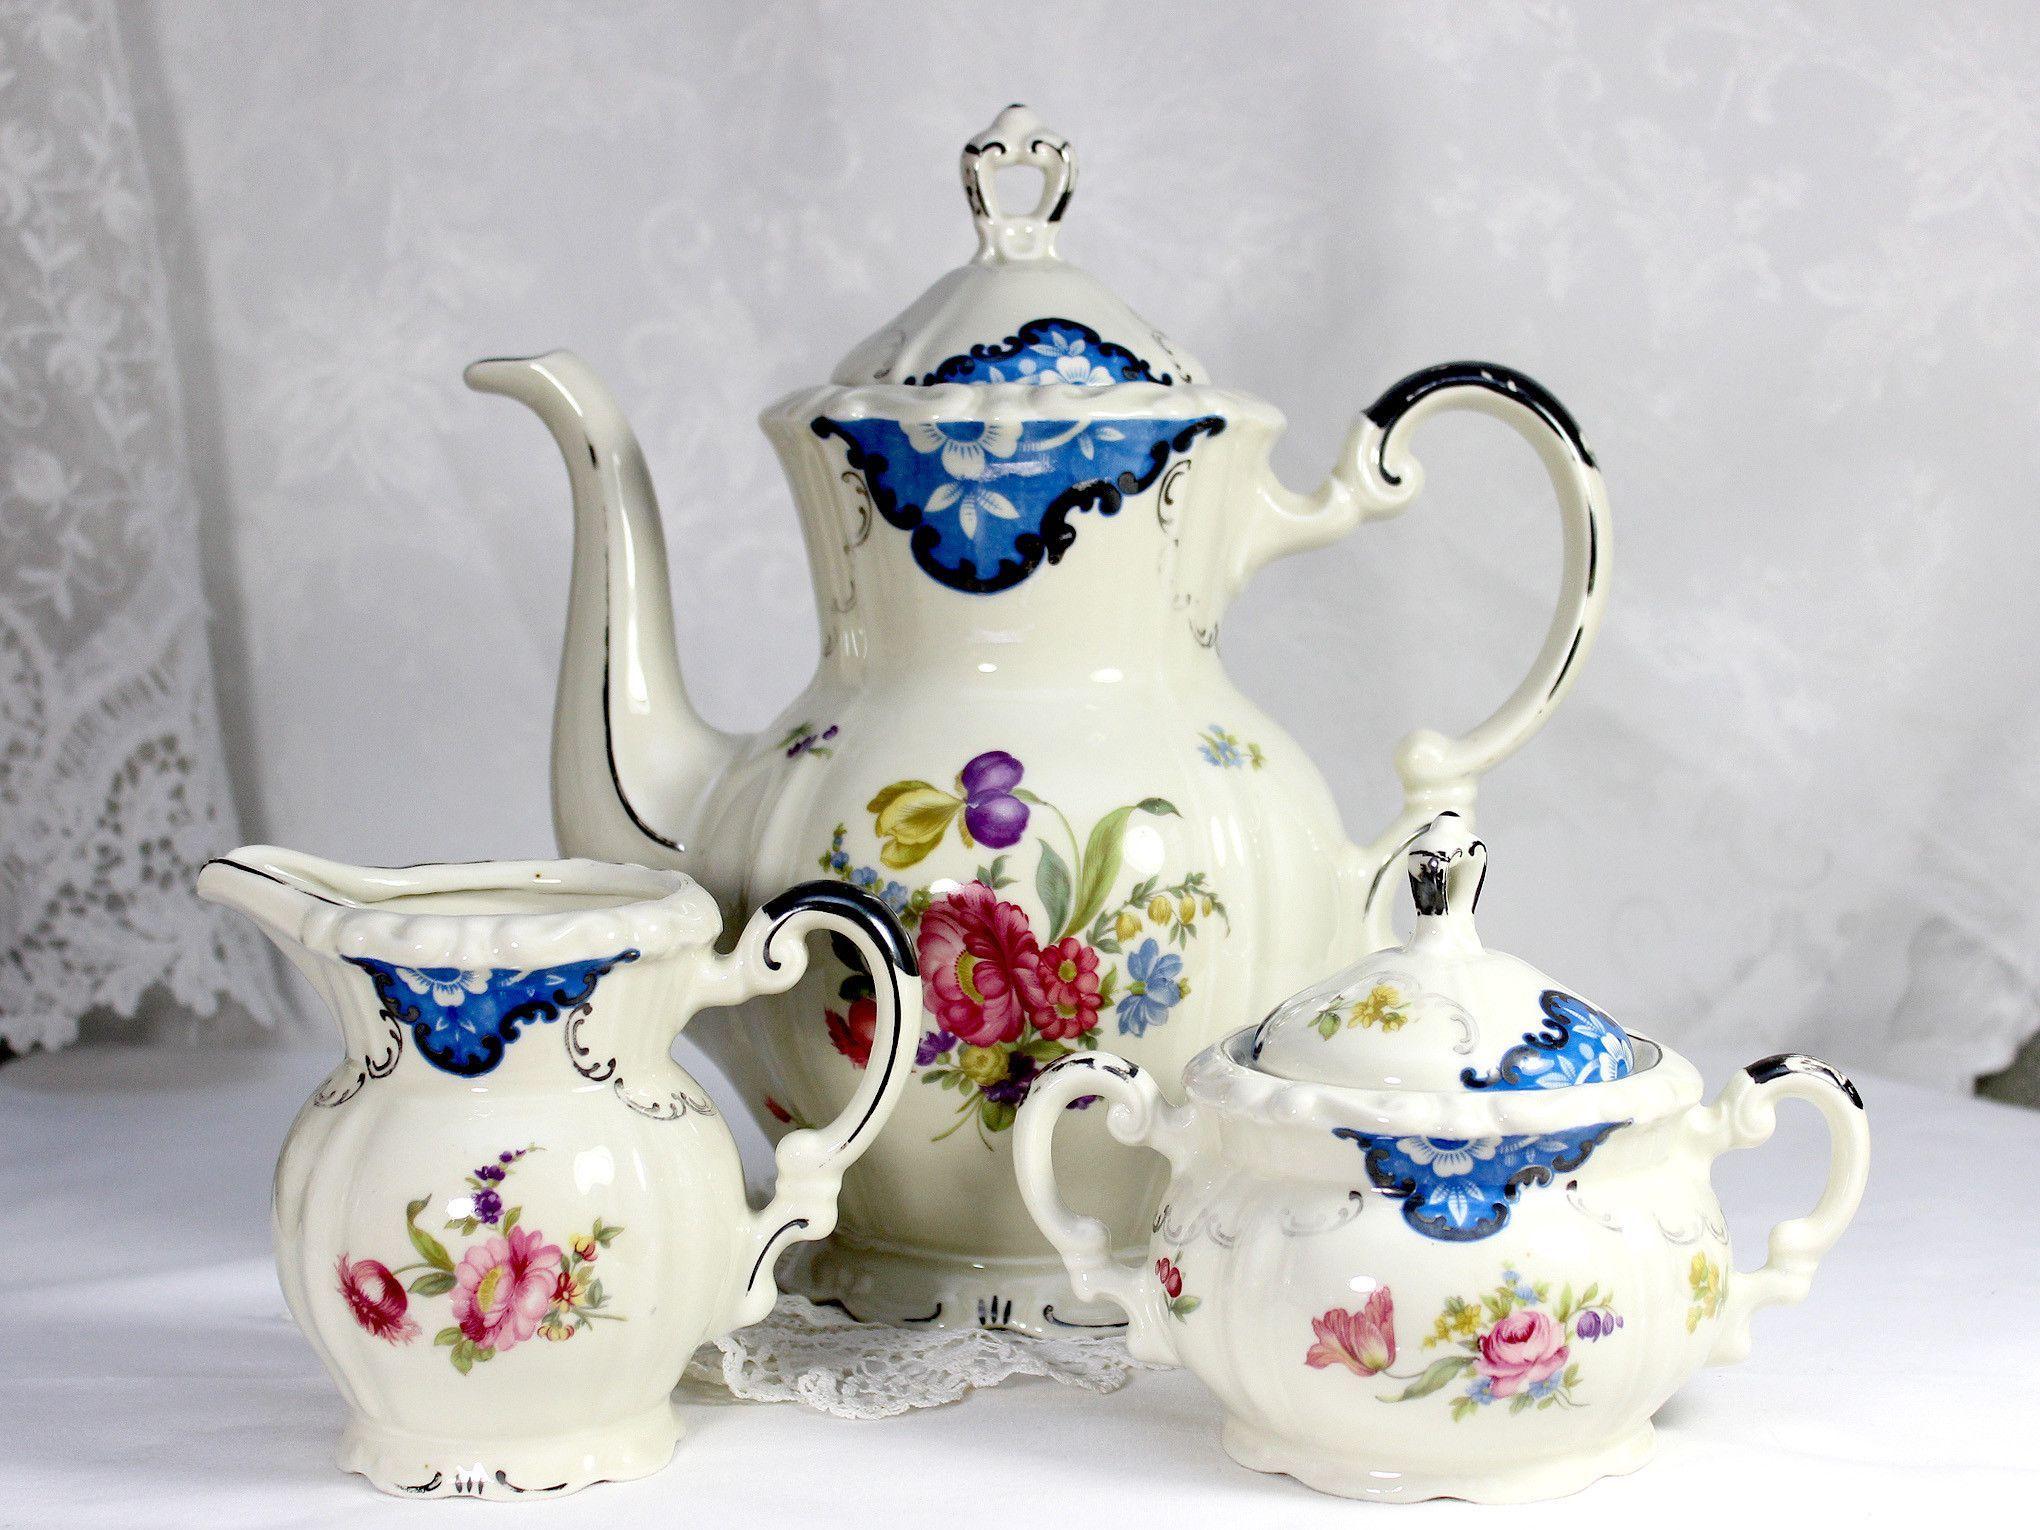 Mitterteich Bavaria Coffee Set, Coffee Pot, Creamer, Sugar Bowl And